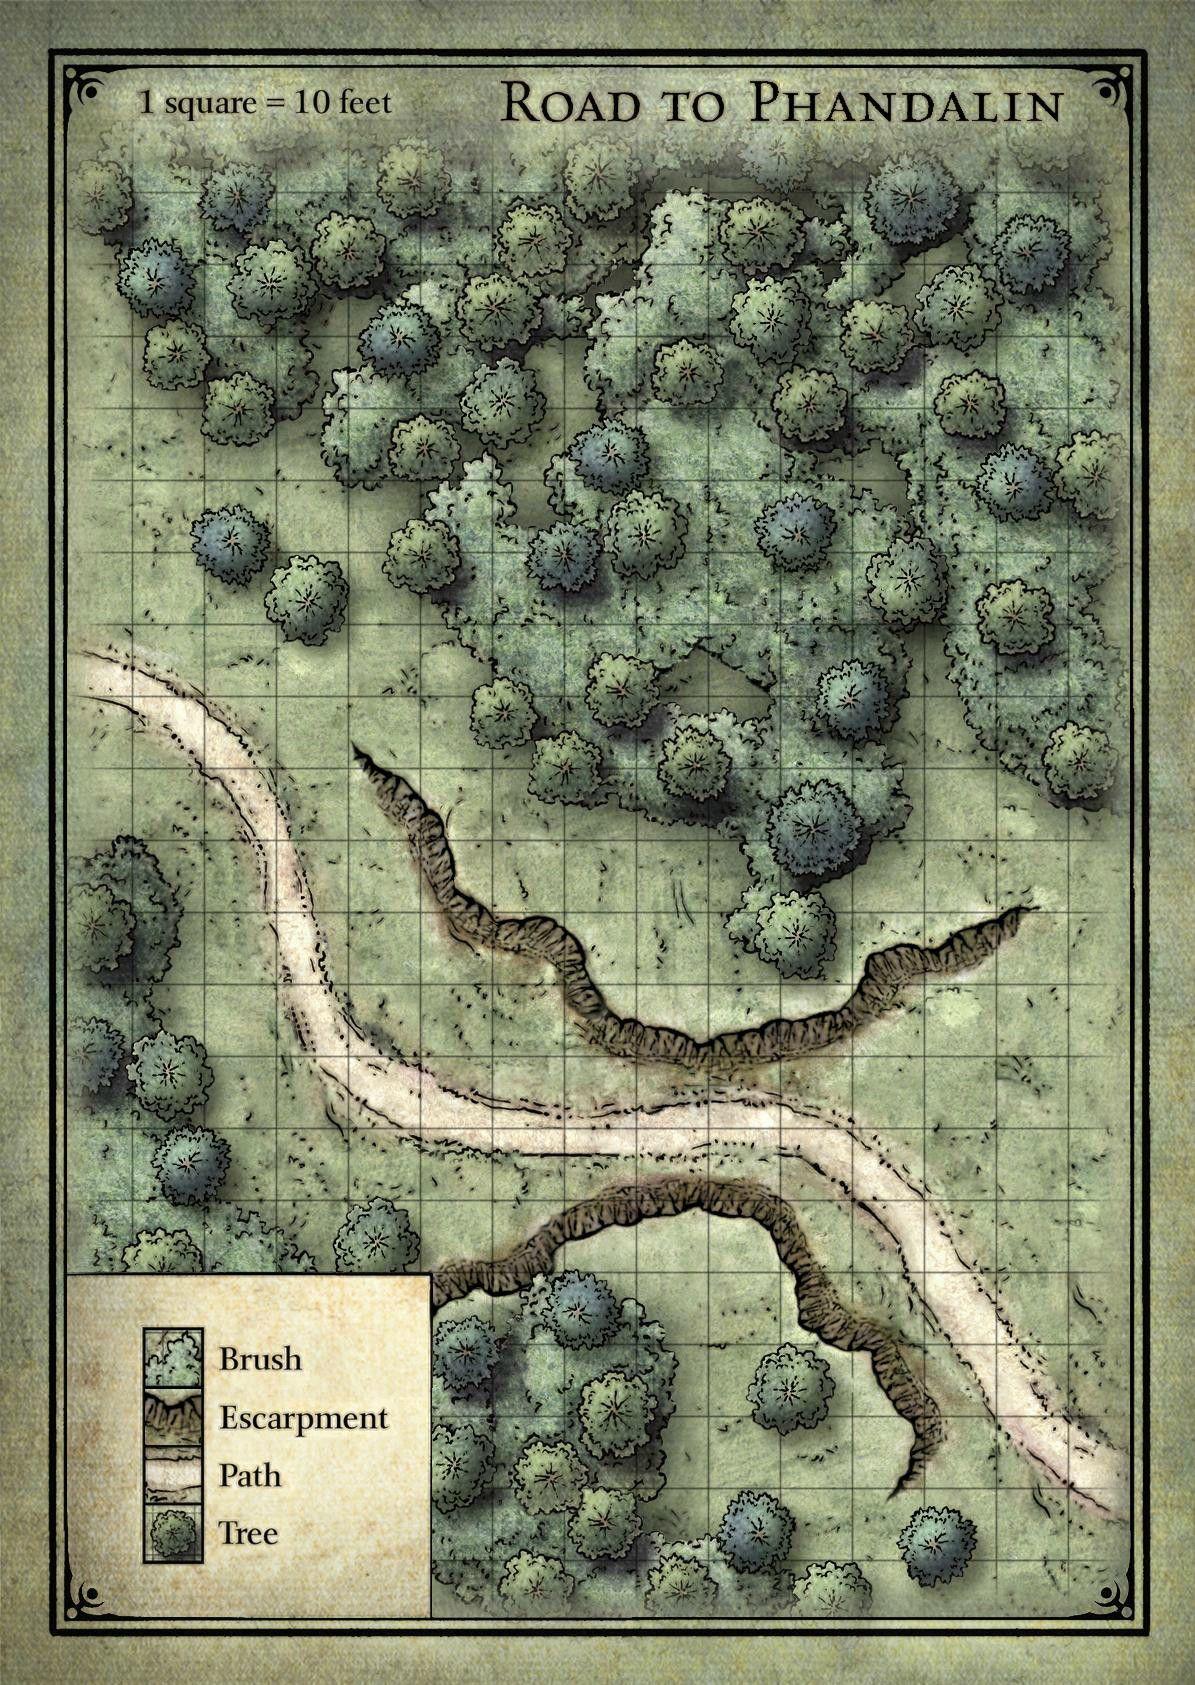 Estrada Para Phandalin Mapa De Fantasia Mapas Clasicos Mapas